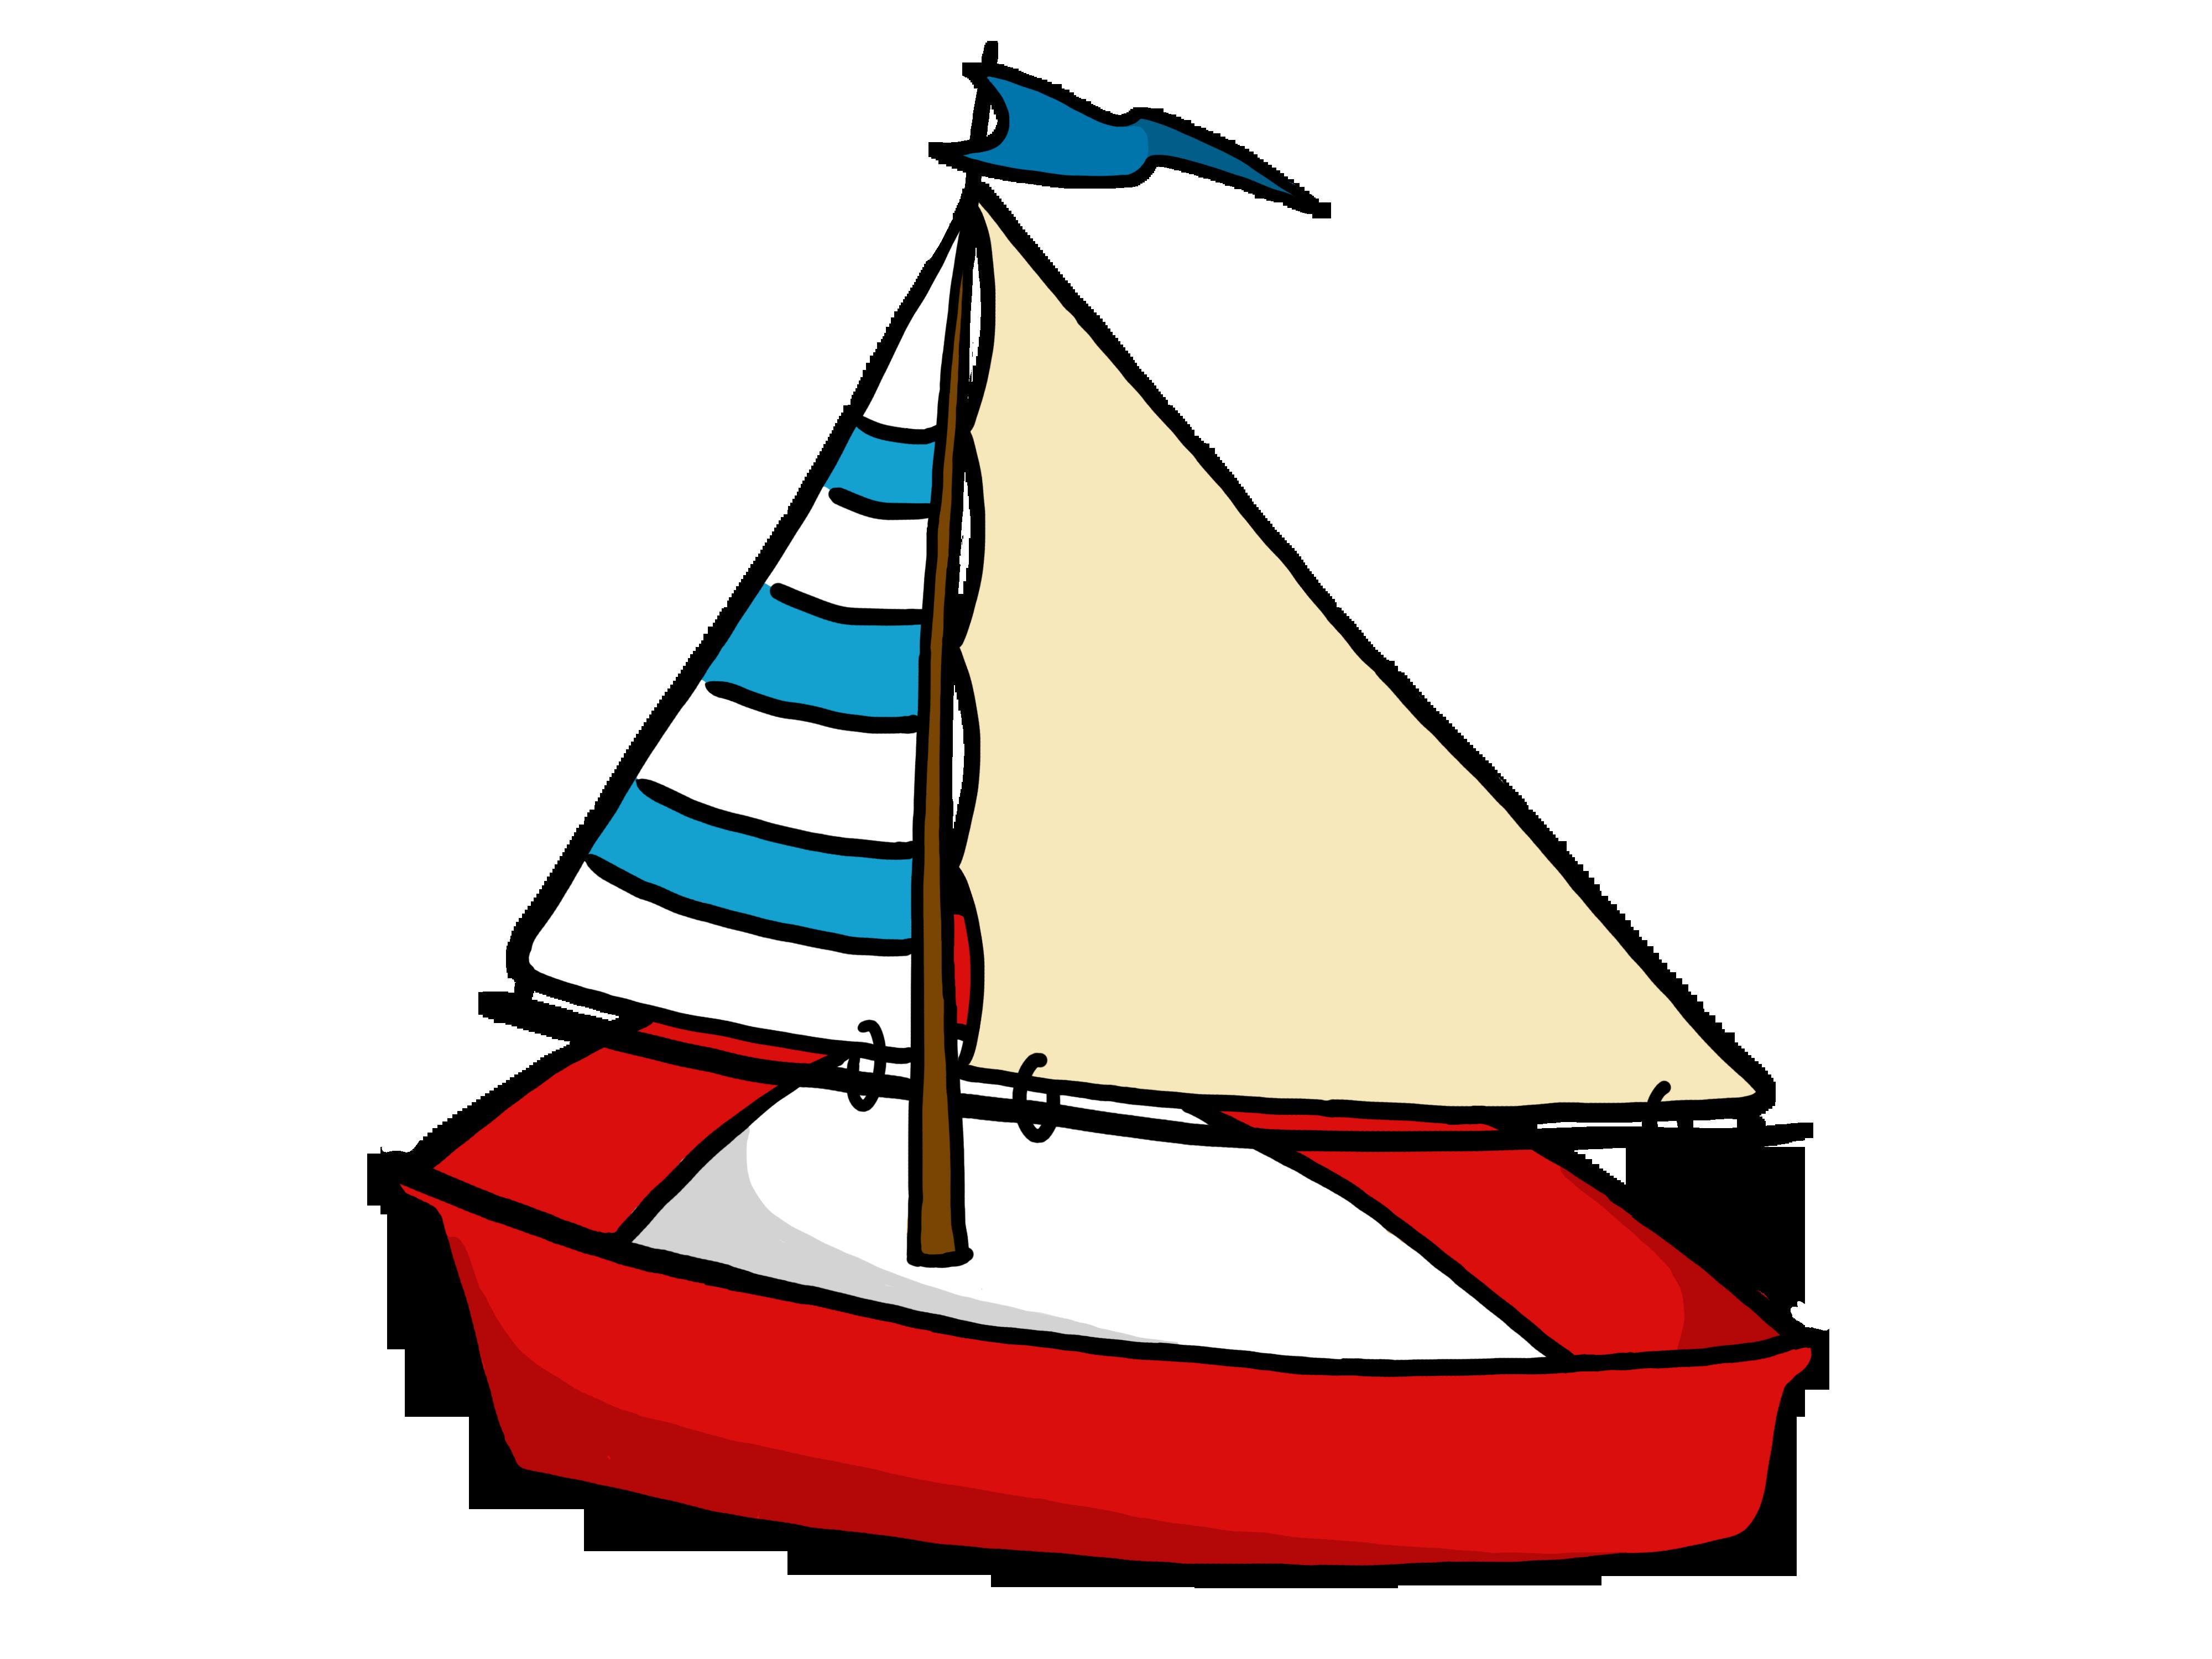 Toy Boat Toy Boat Boat Clip Art